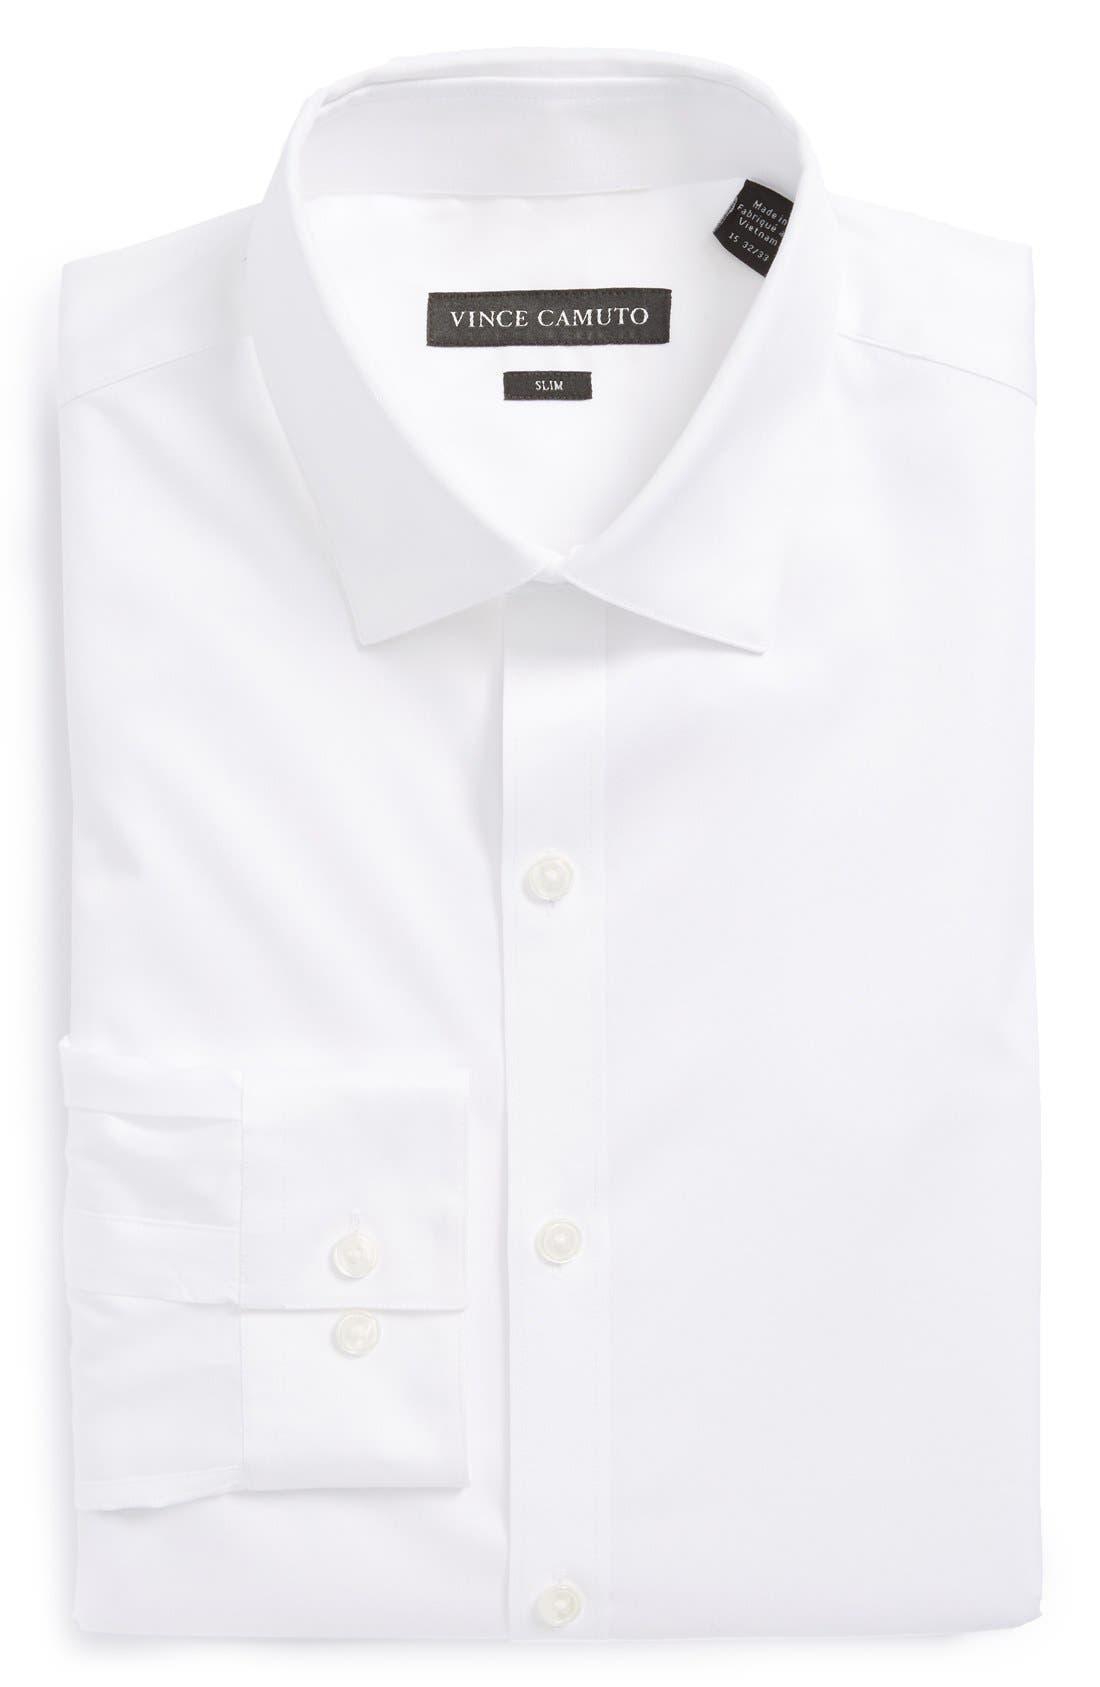 Main Image - Vince Camuto Slim Fit Solid Dress Shirt